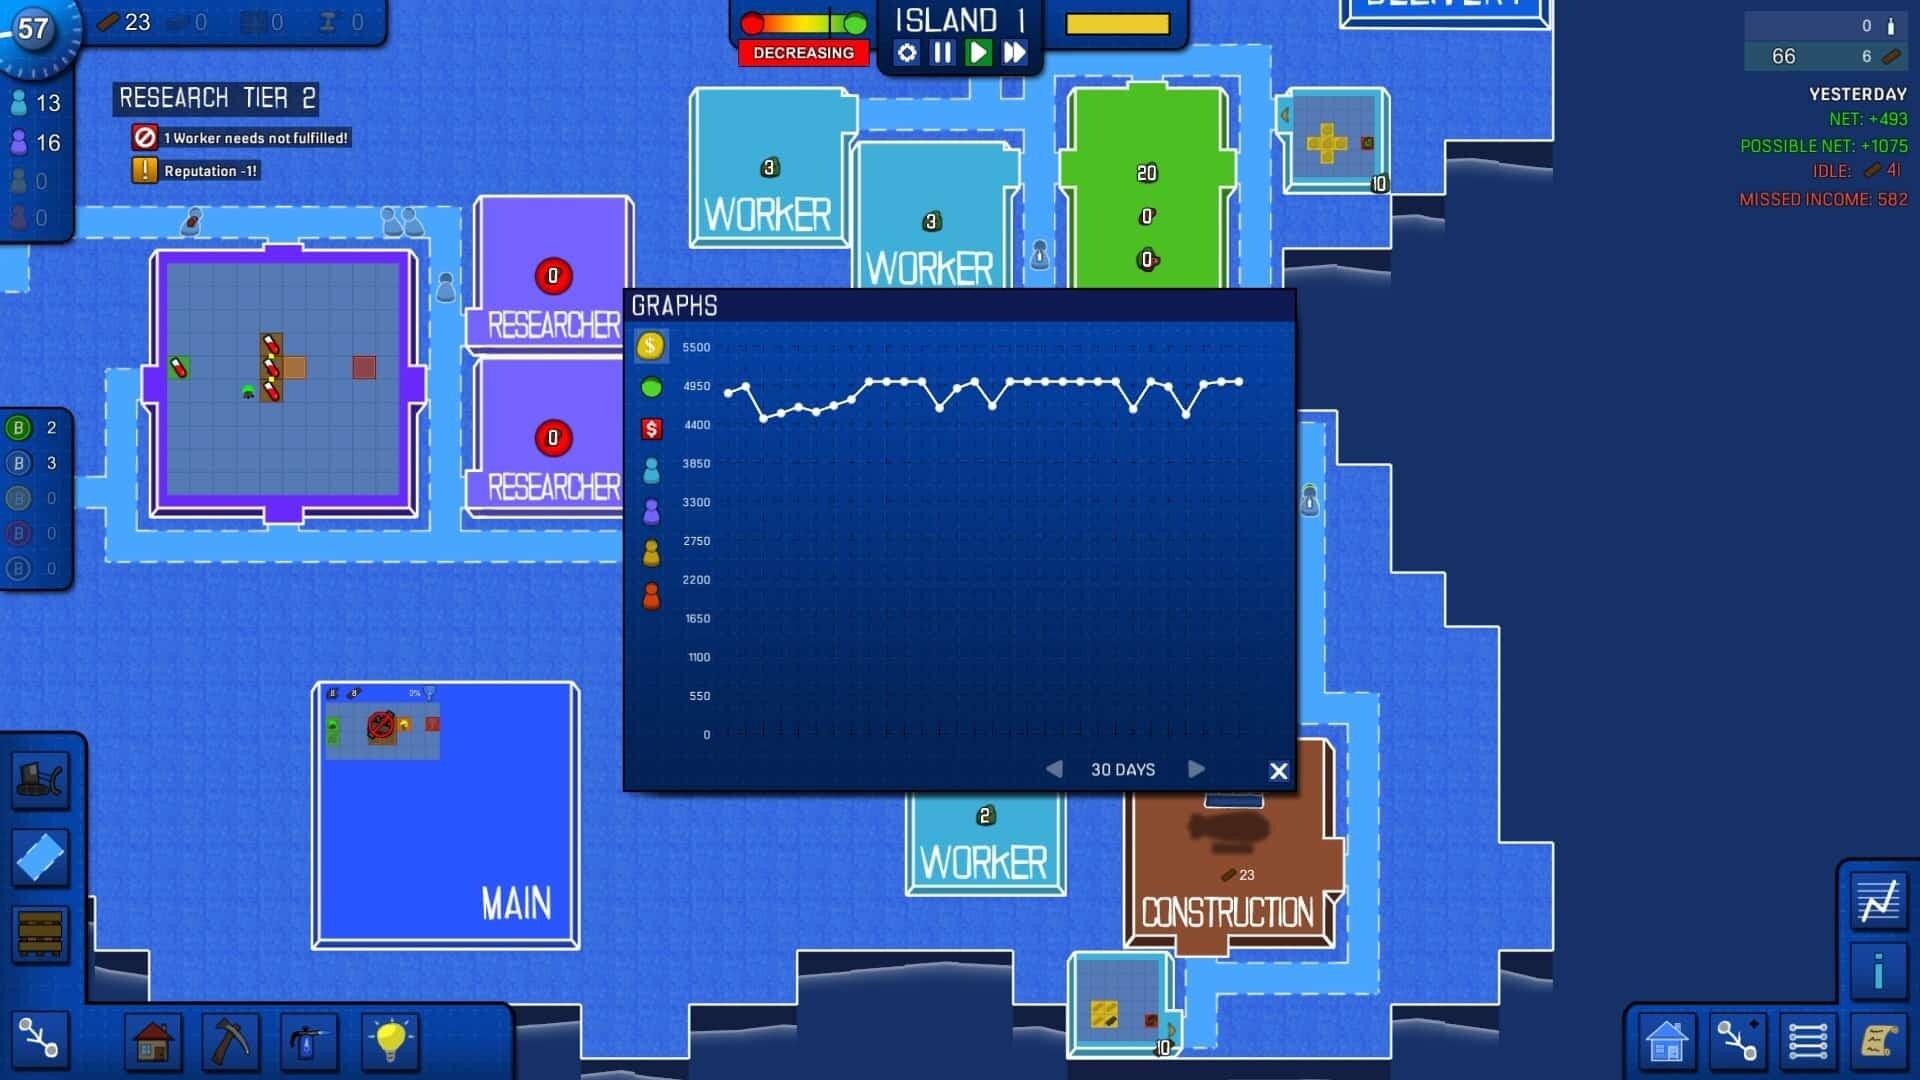 Blueprint Tycoon game screenshot, income chart